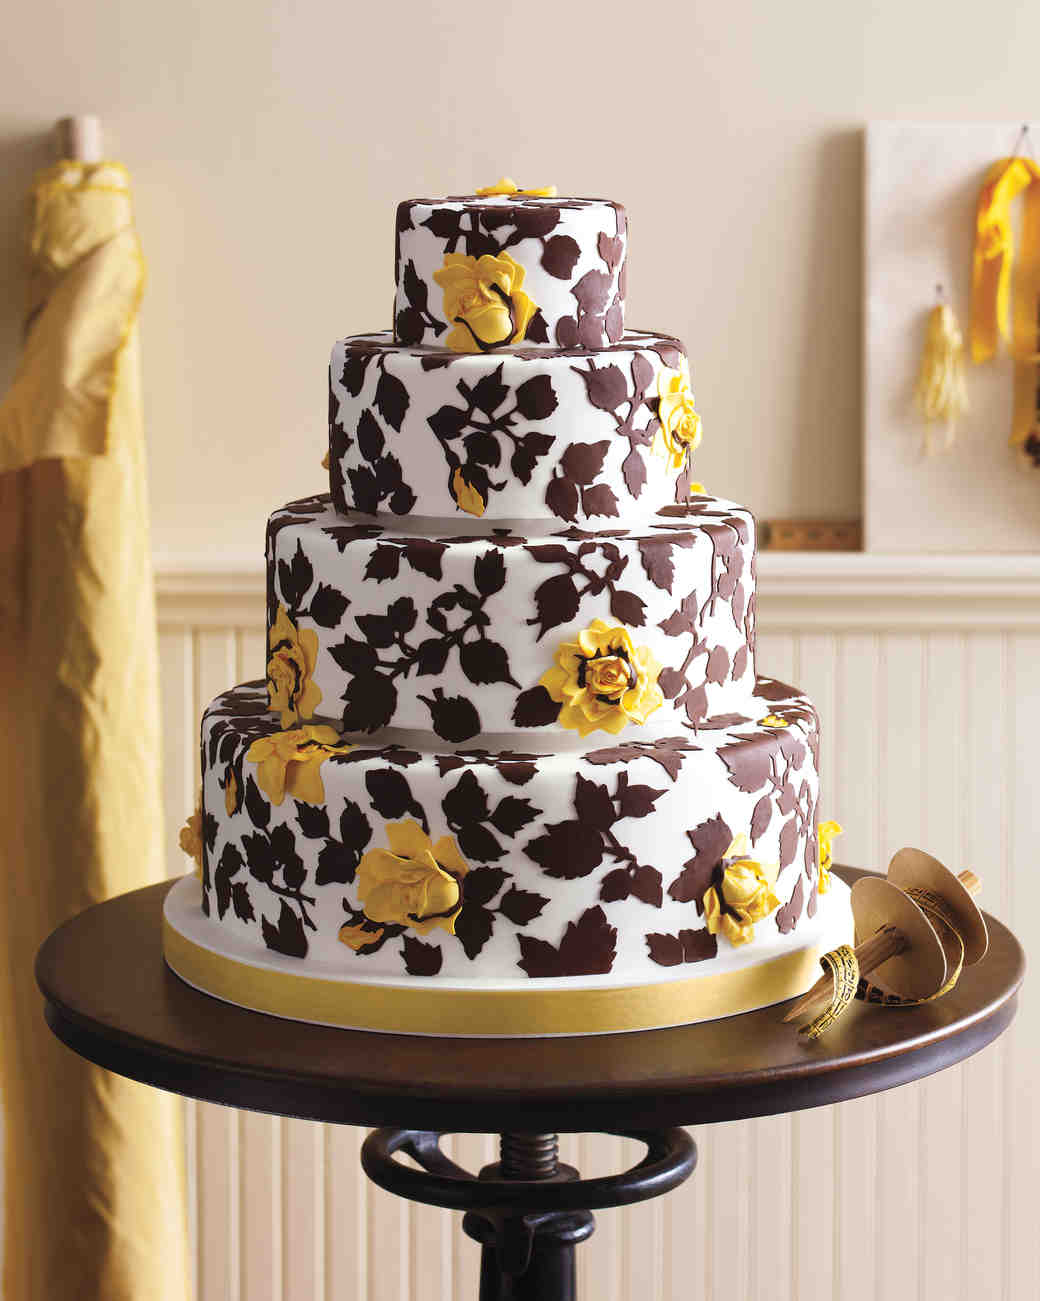 ron-ben-israel-cakes-spring-2010-mwd105426rose4a-0814.jpg